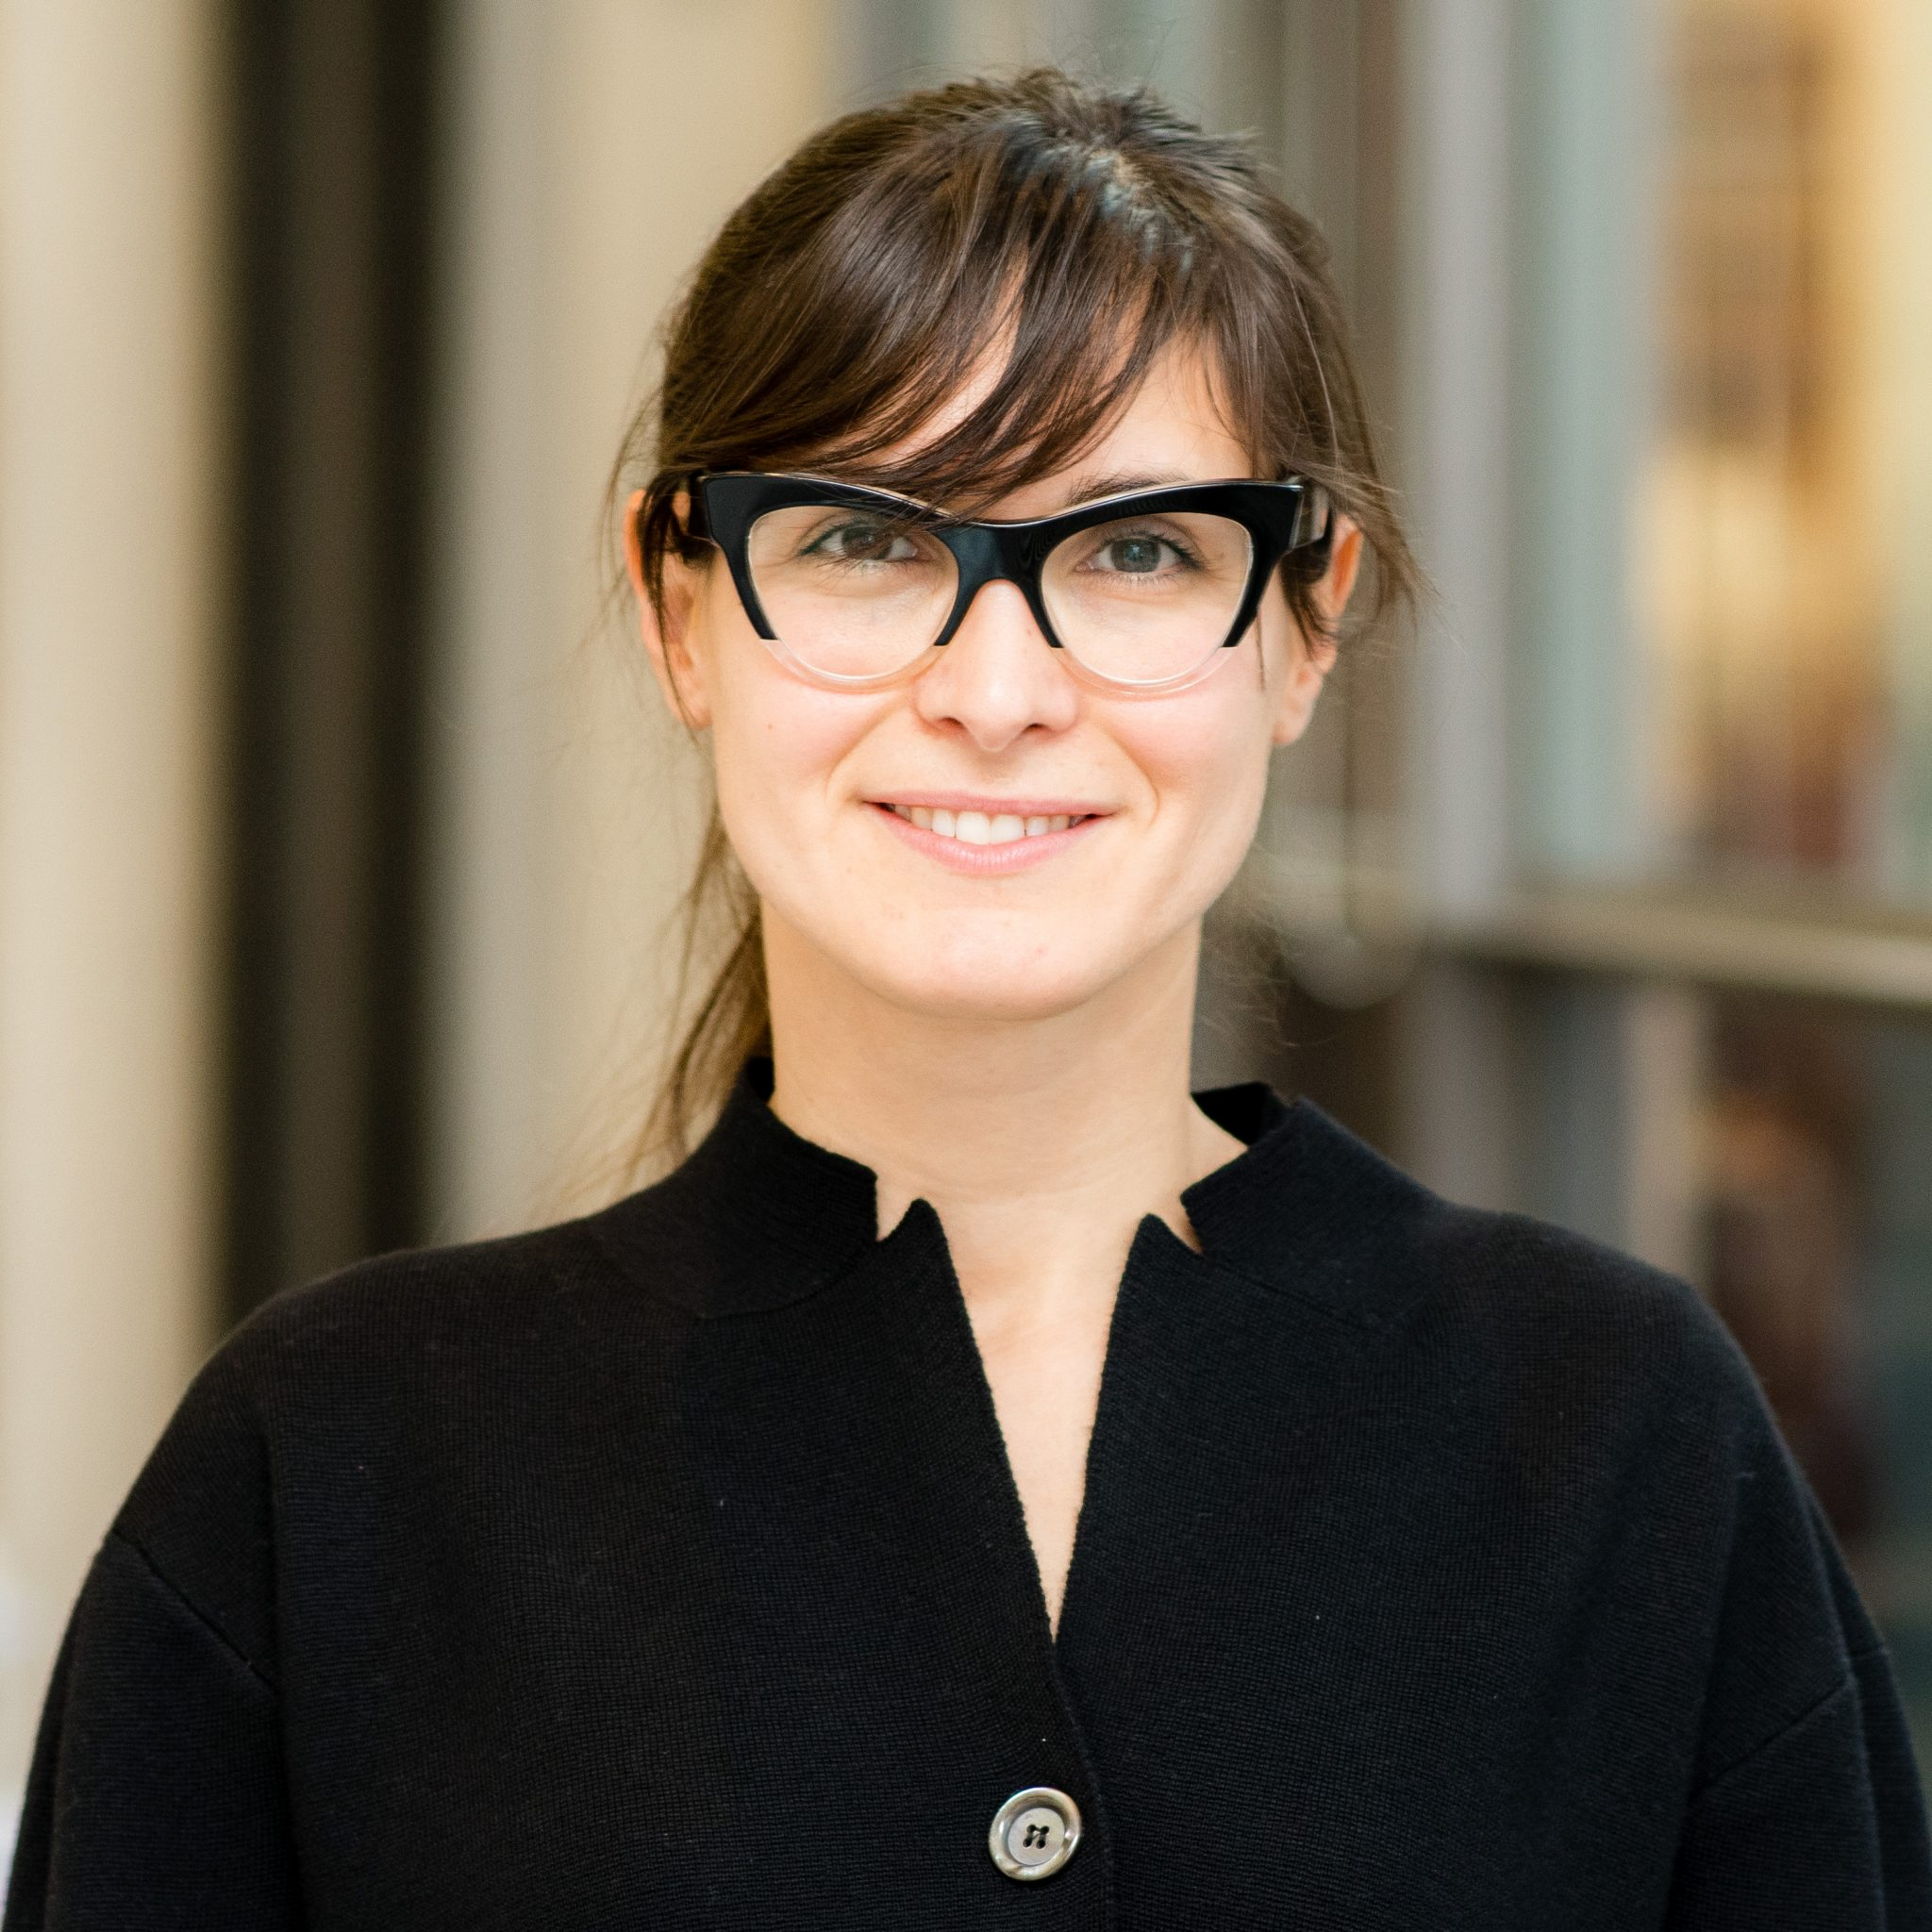 Anastasia Ferrucci